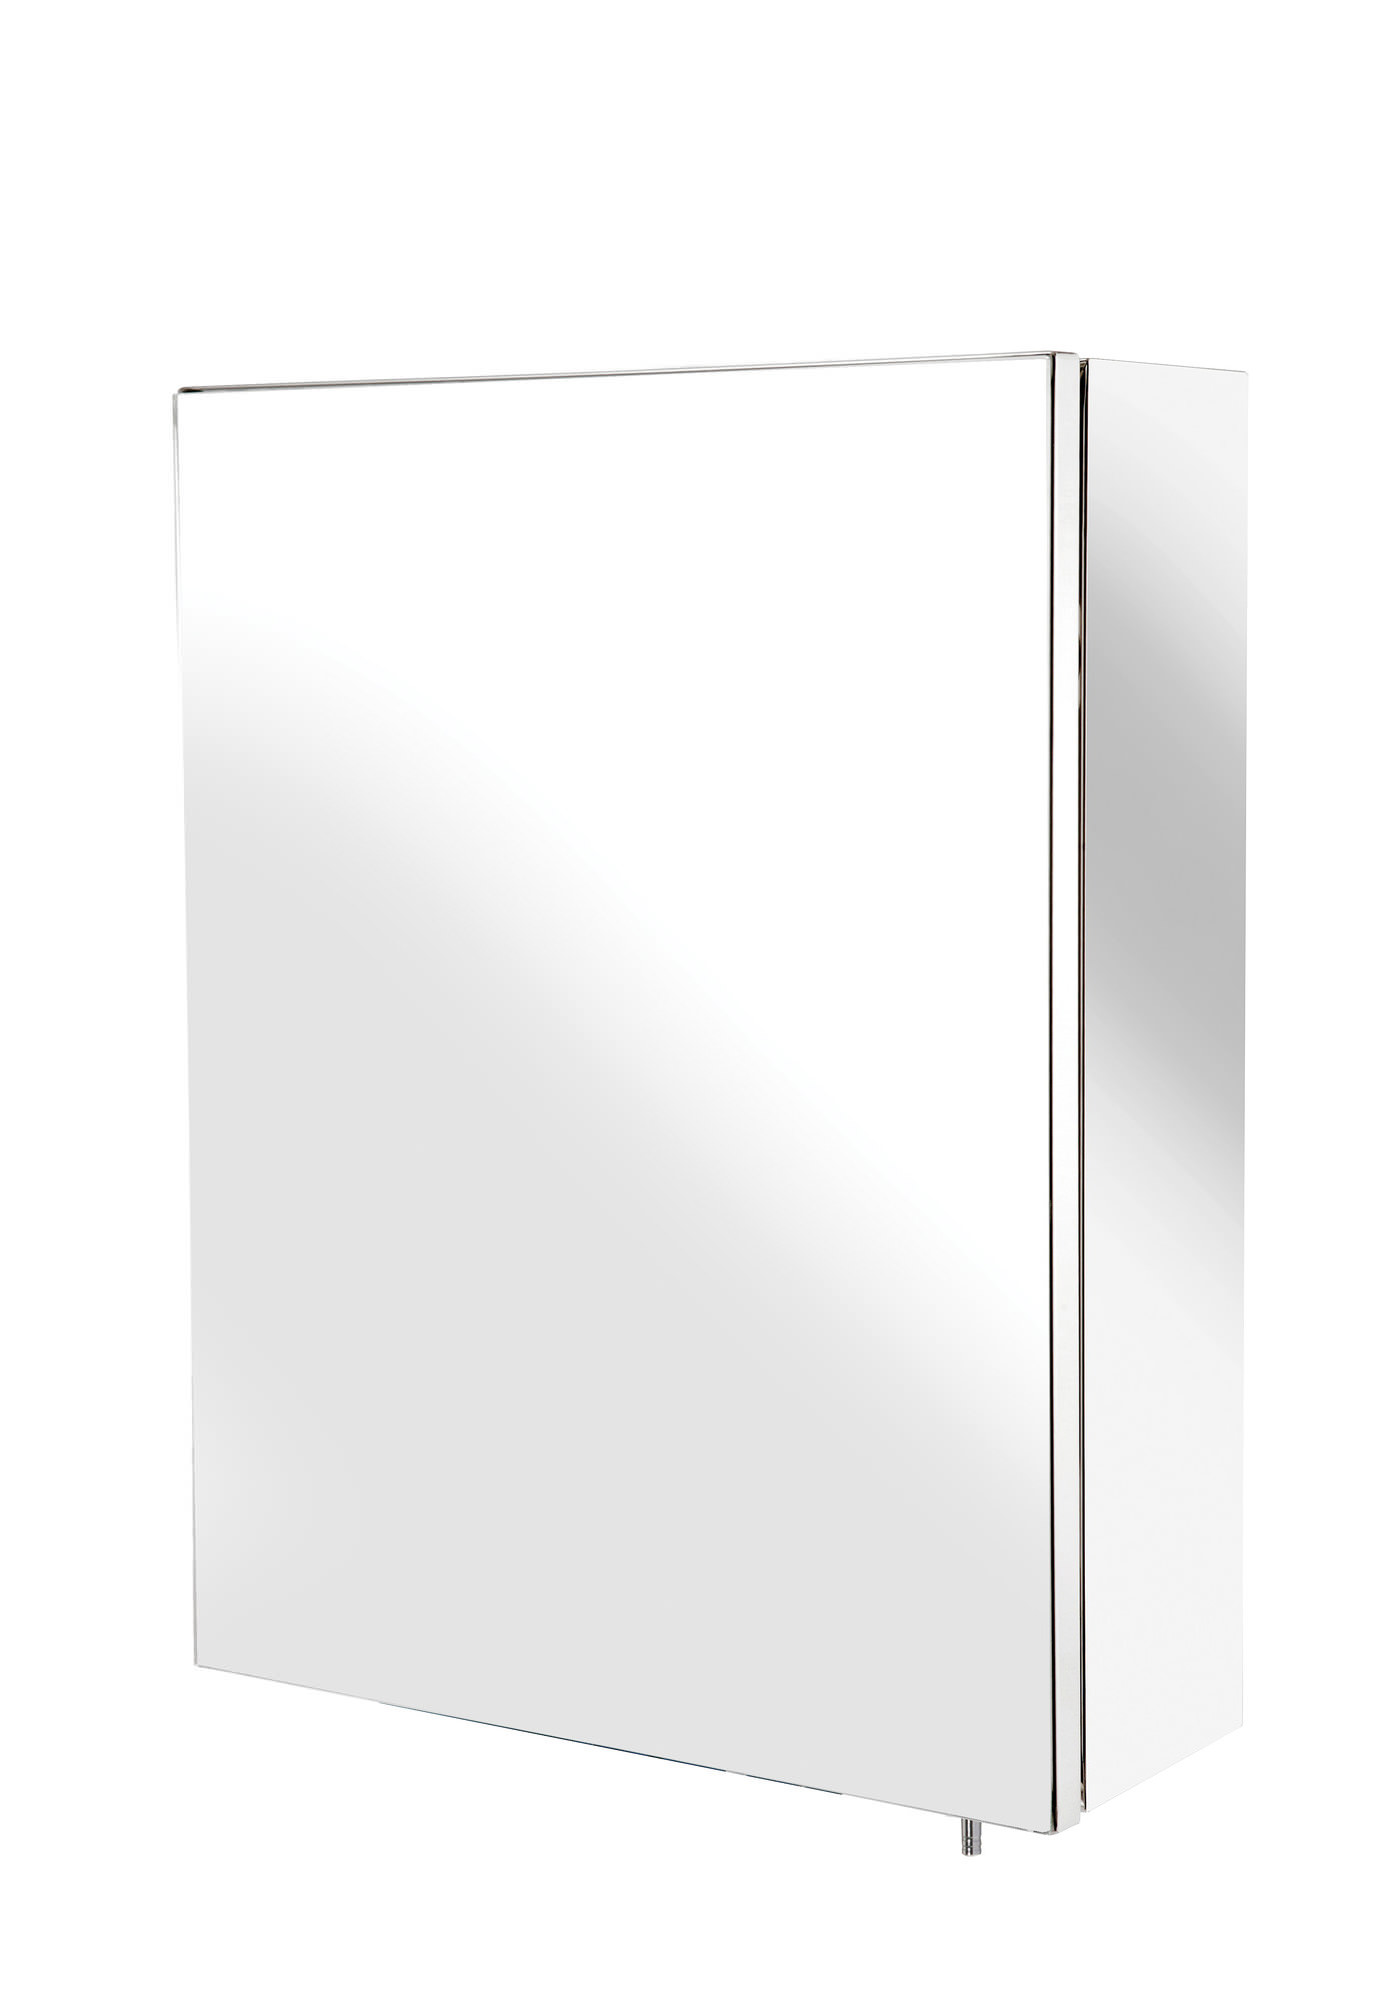 Croydex Avon Stainless Steel Single Door Small Mirror Cabinet | WC856005